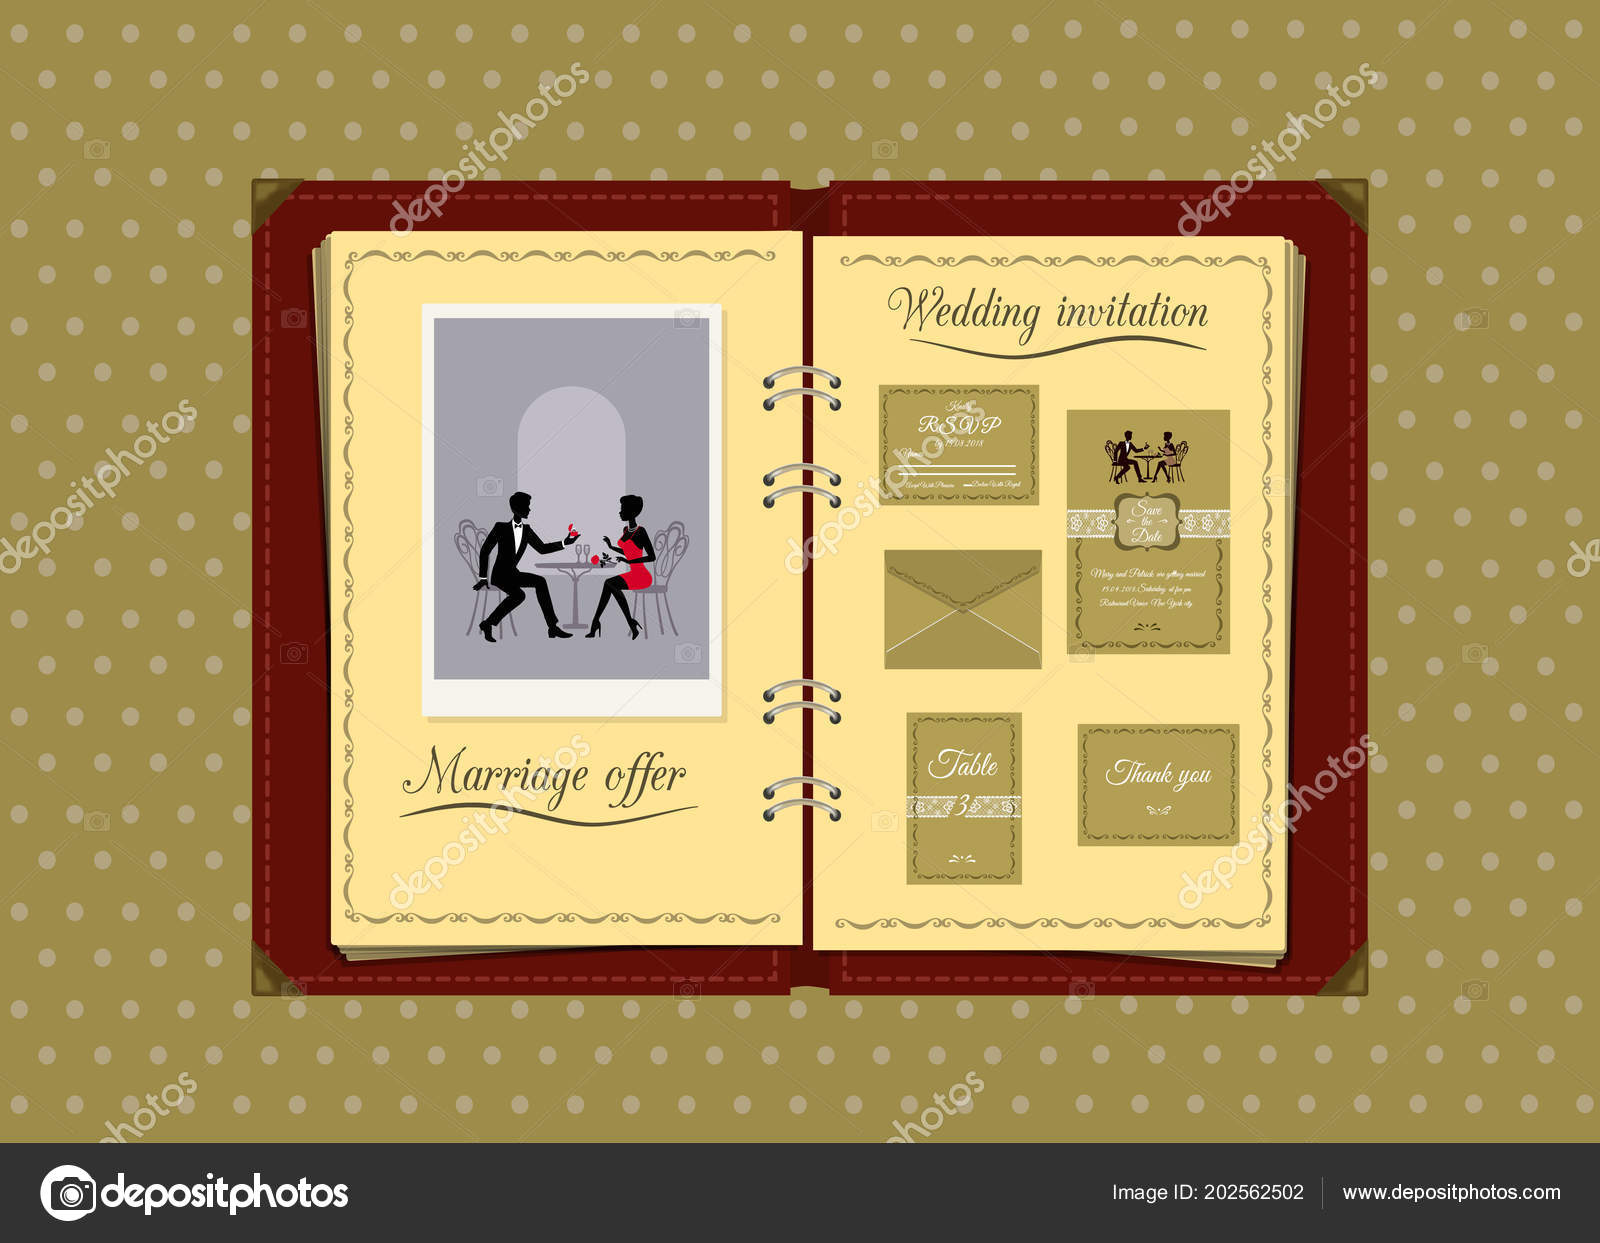 Vector illustration album wedding invitation vetores de stock vector illustration album wedding invitation vetores de stock stopboris Images